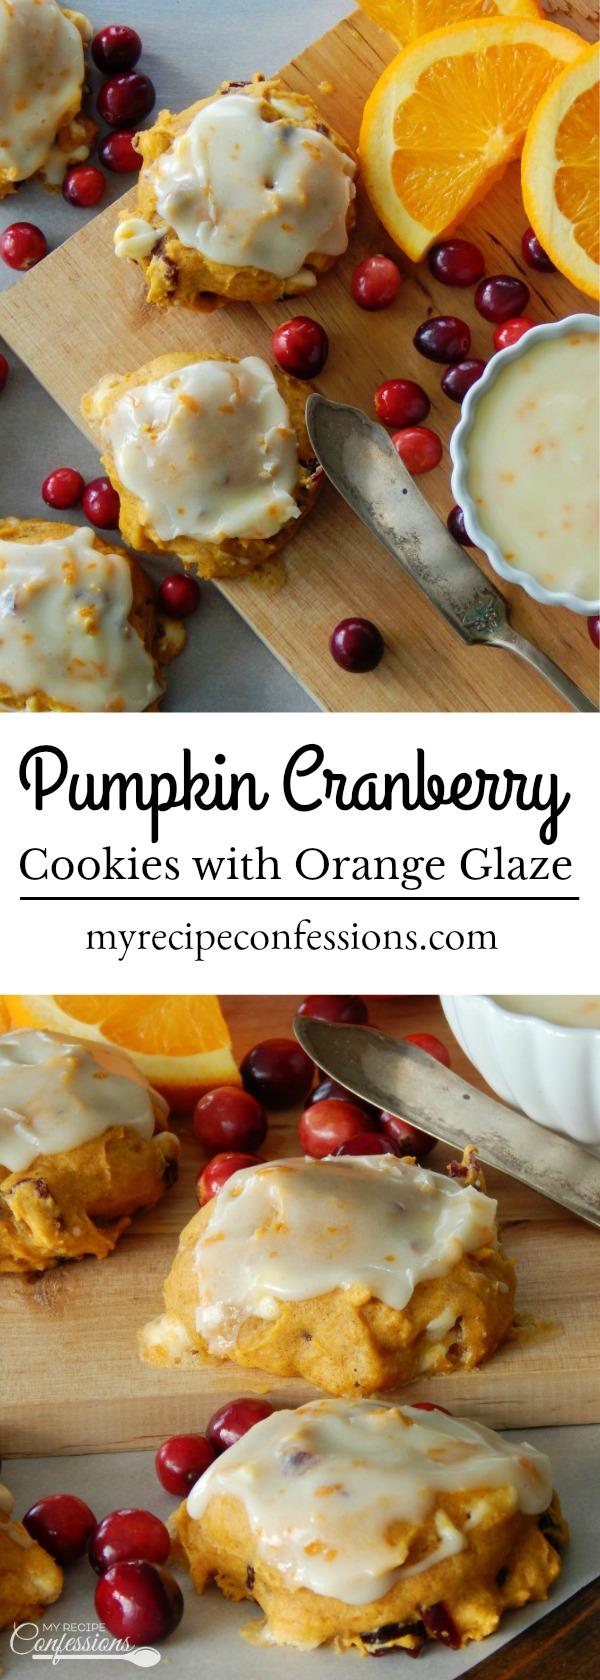 Pumpkin Cranberry Cookies with Orange Glaze - My Recipe ...